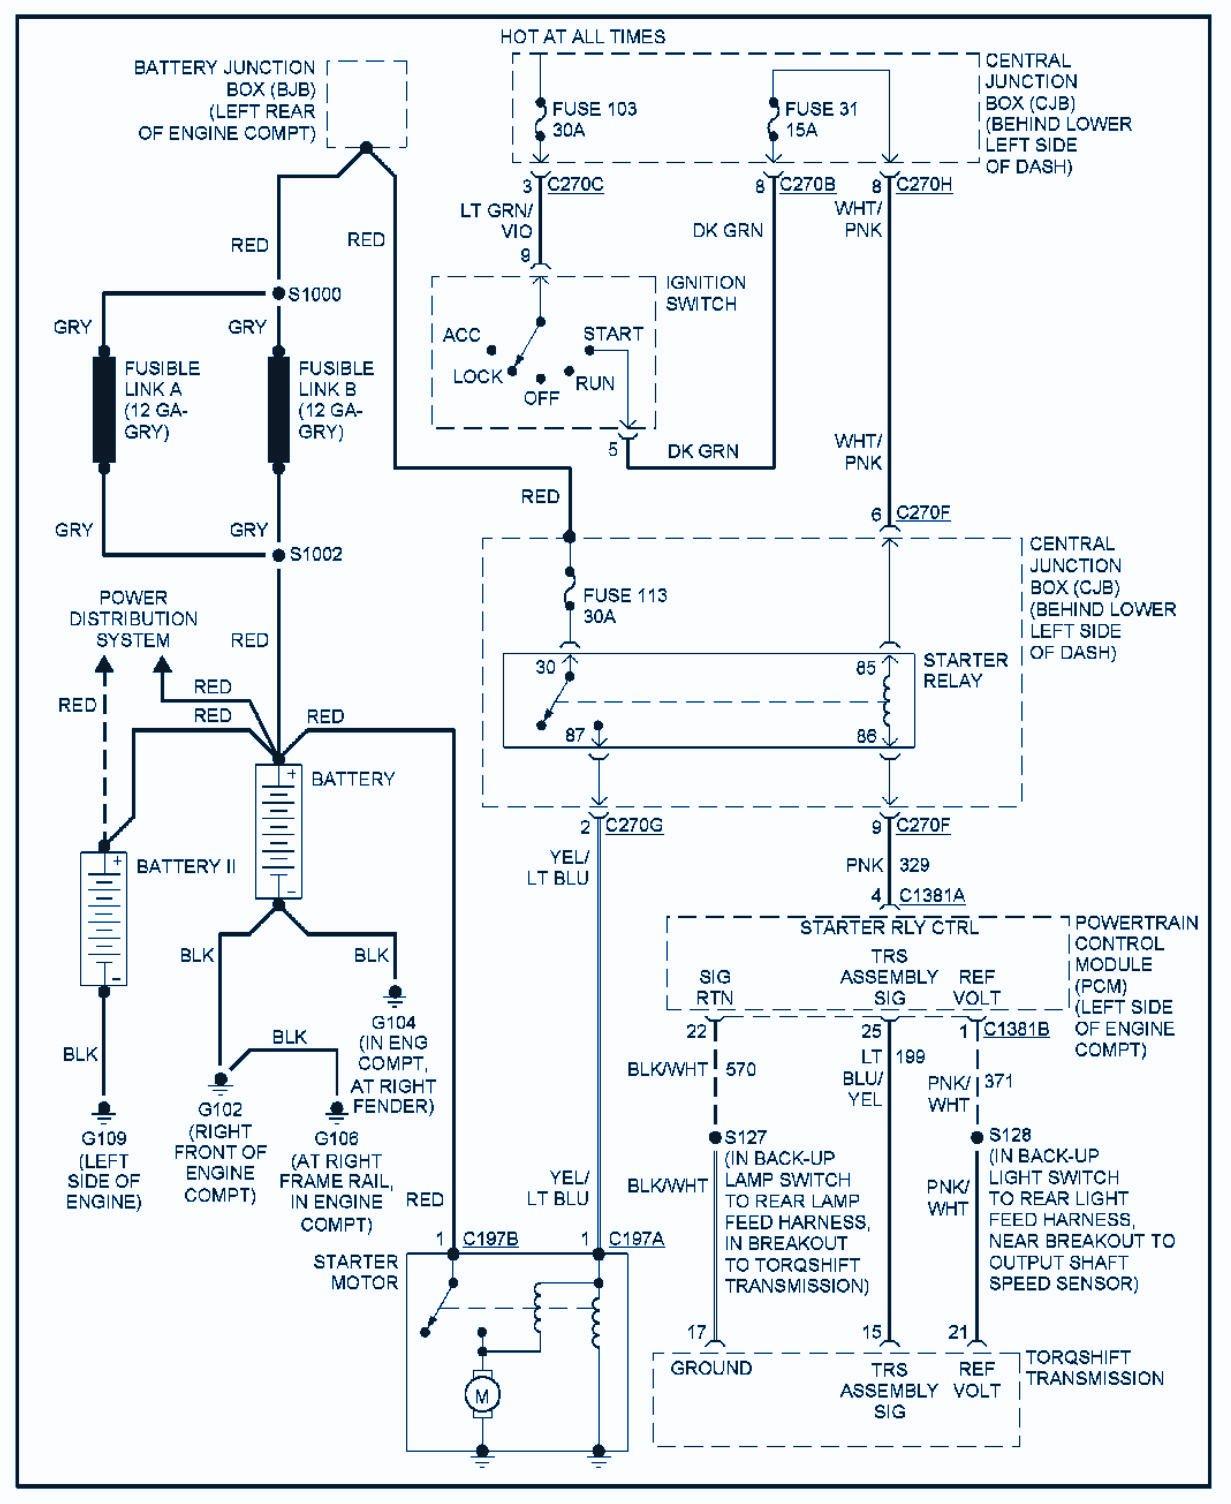 2013 F350 Wiring Schematic Electrical Diagram House 2012 Fuse Box 4x4 Ford F 350 Diagrams U2022 Rh Detox Design Co 1991 Schematics Stereo